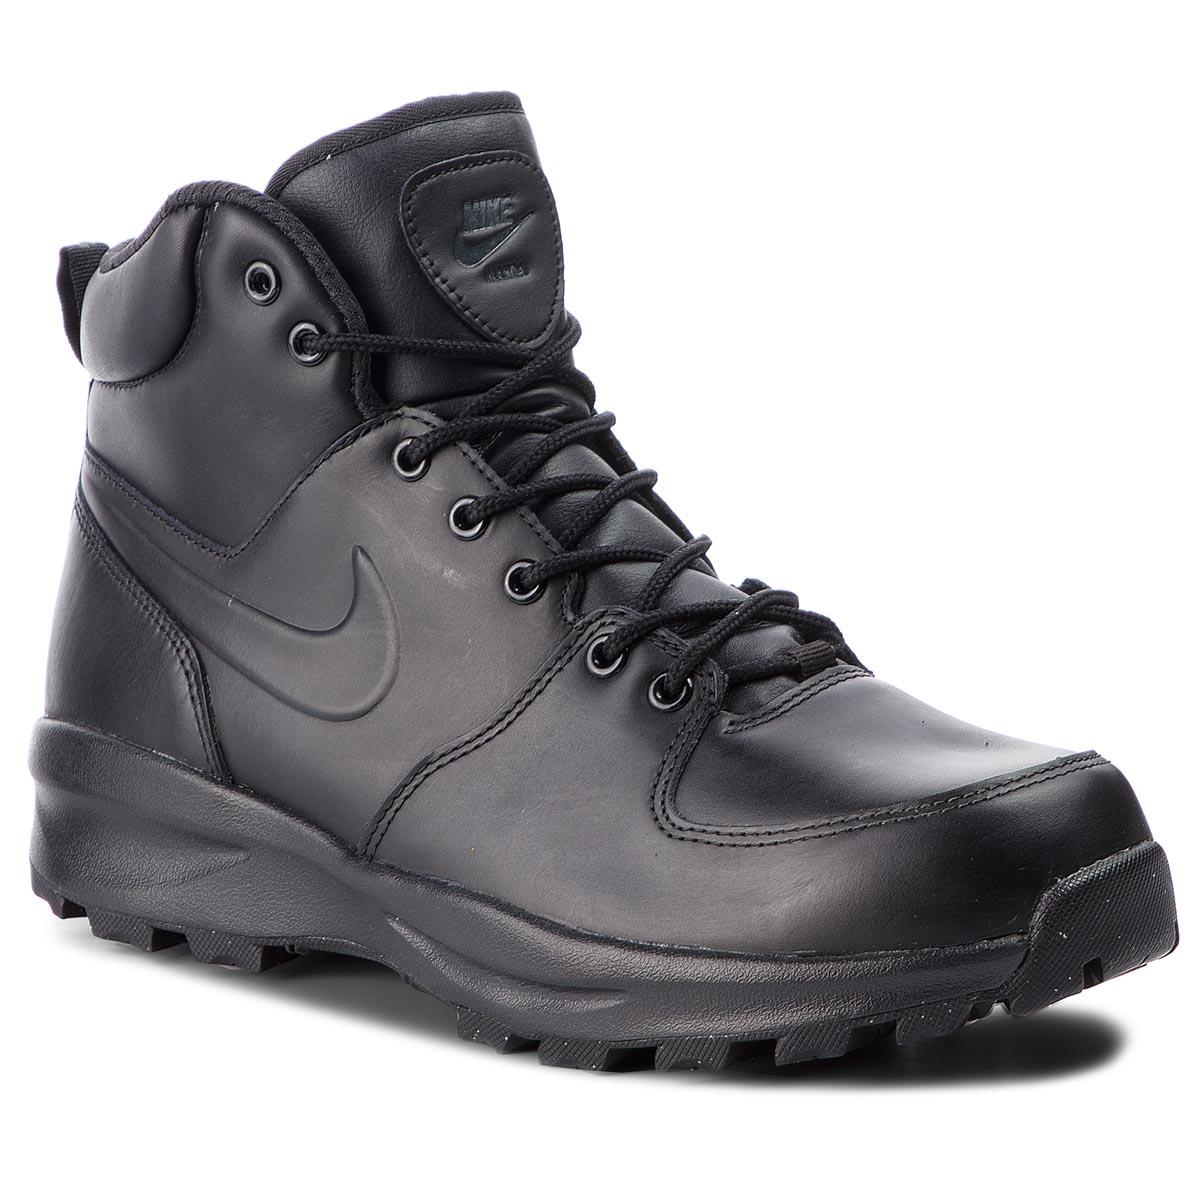 wholesale dealer cae87 f4111 Shoes NIKE Manoa Leather 454350 003 Black Black Black